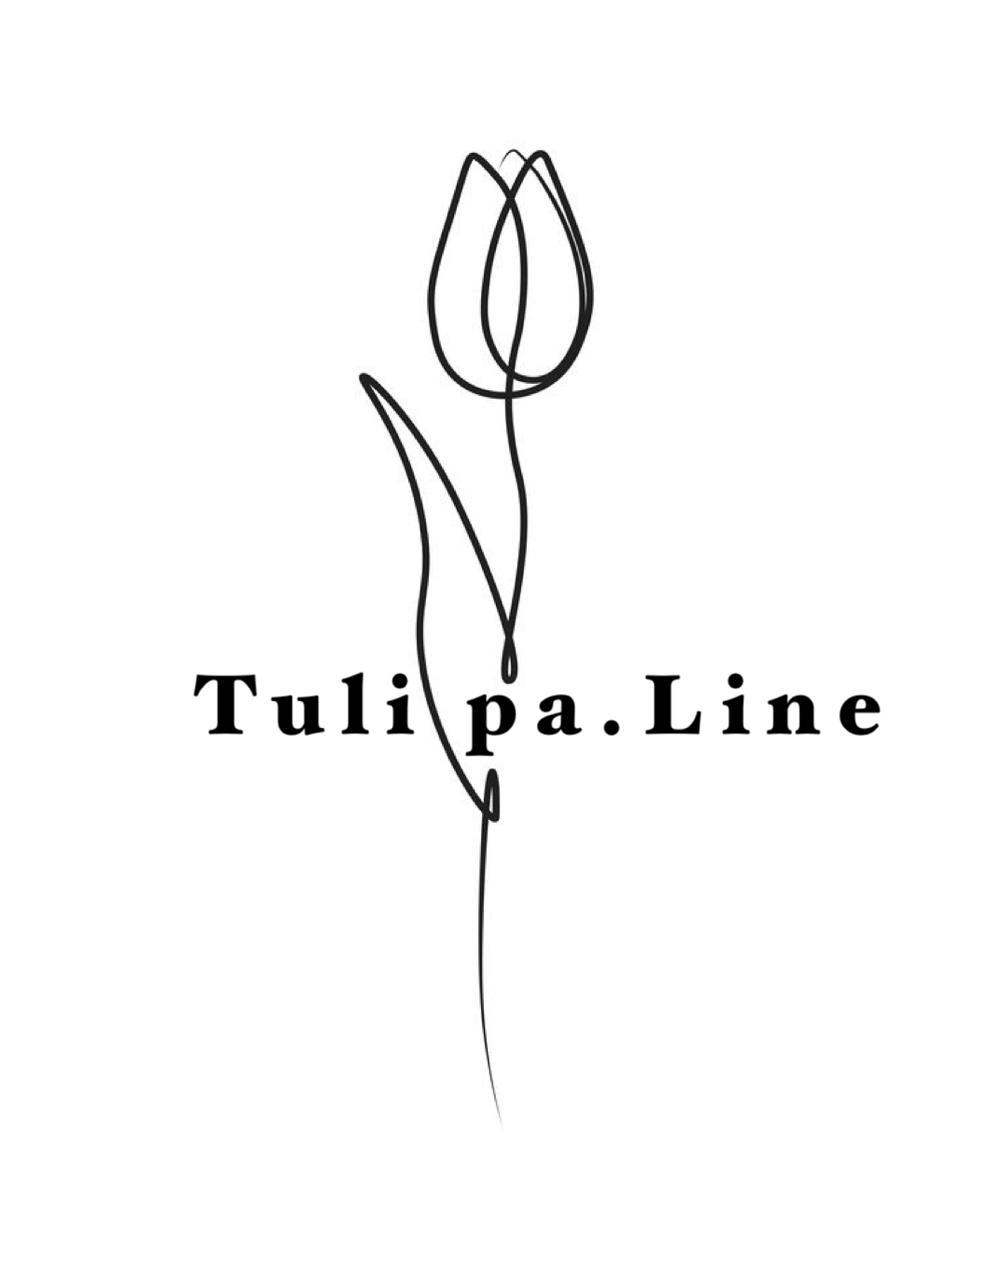 Tulipa.line